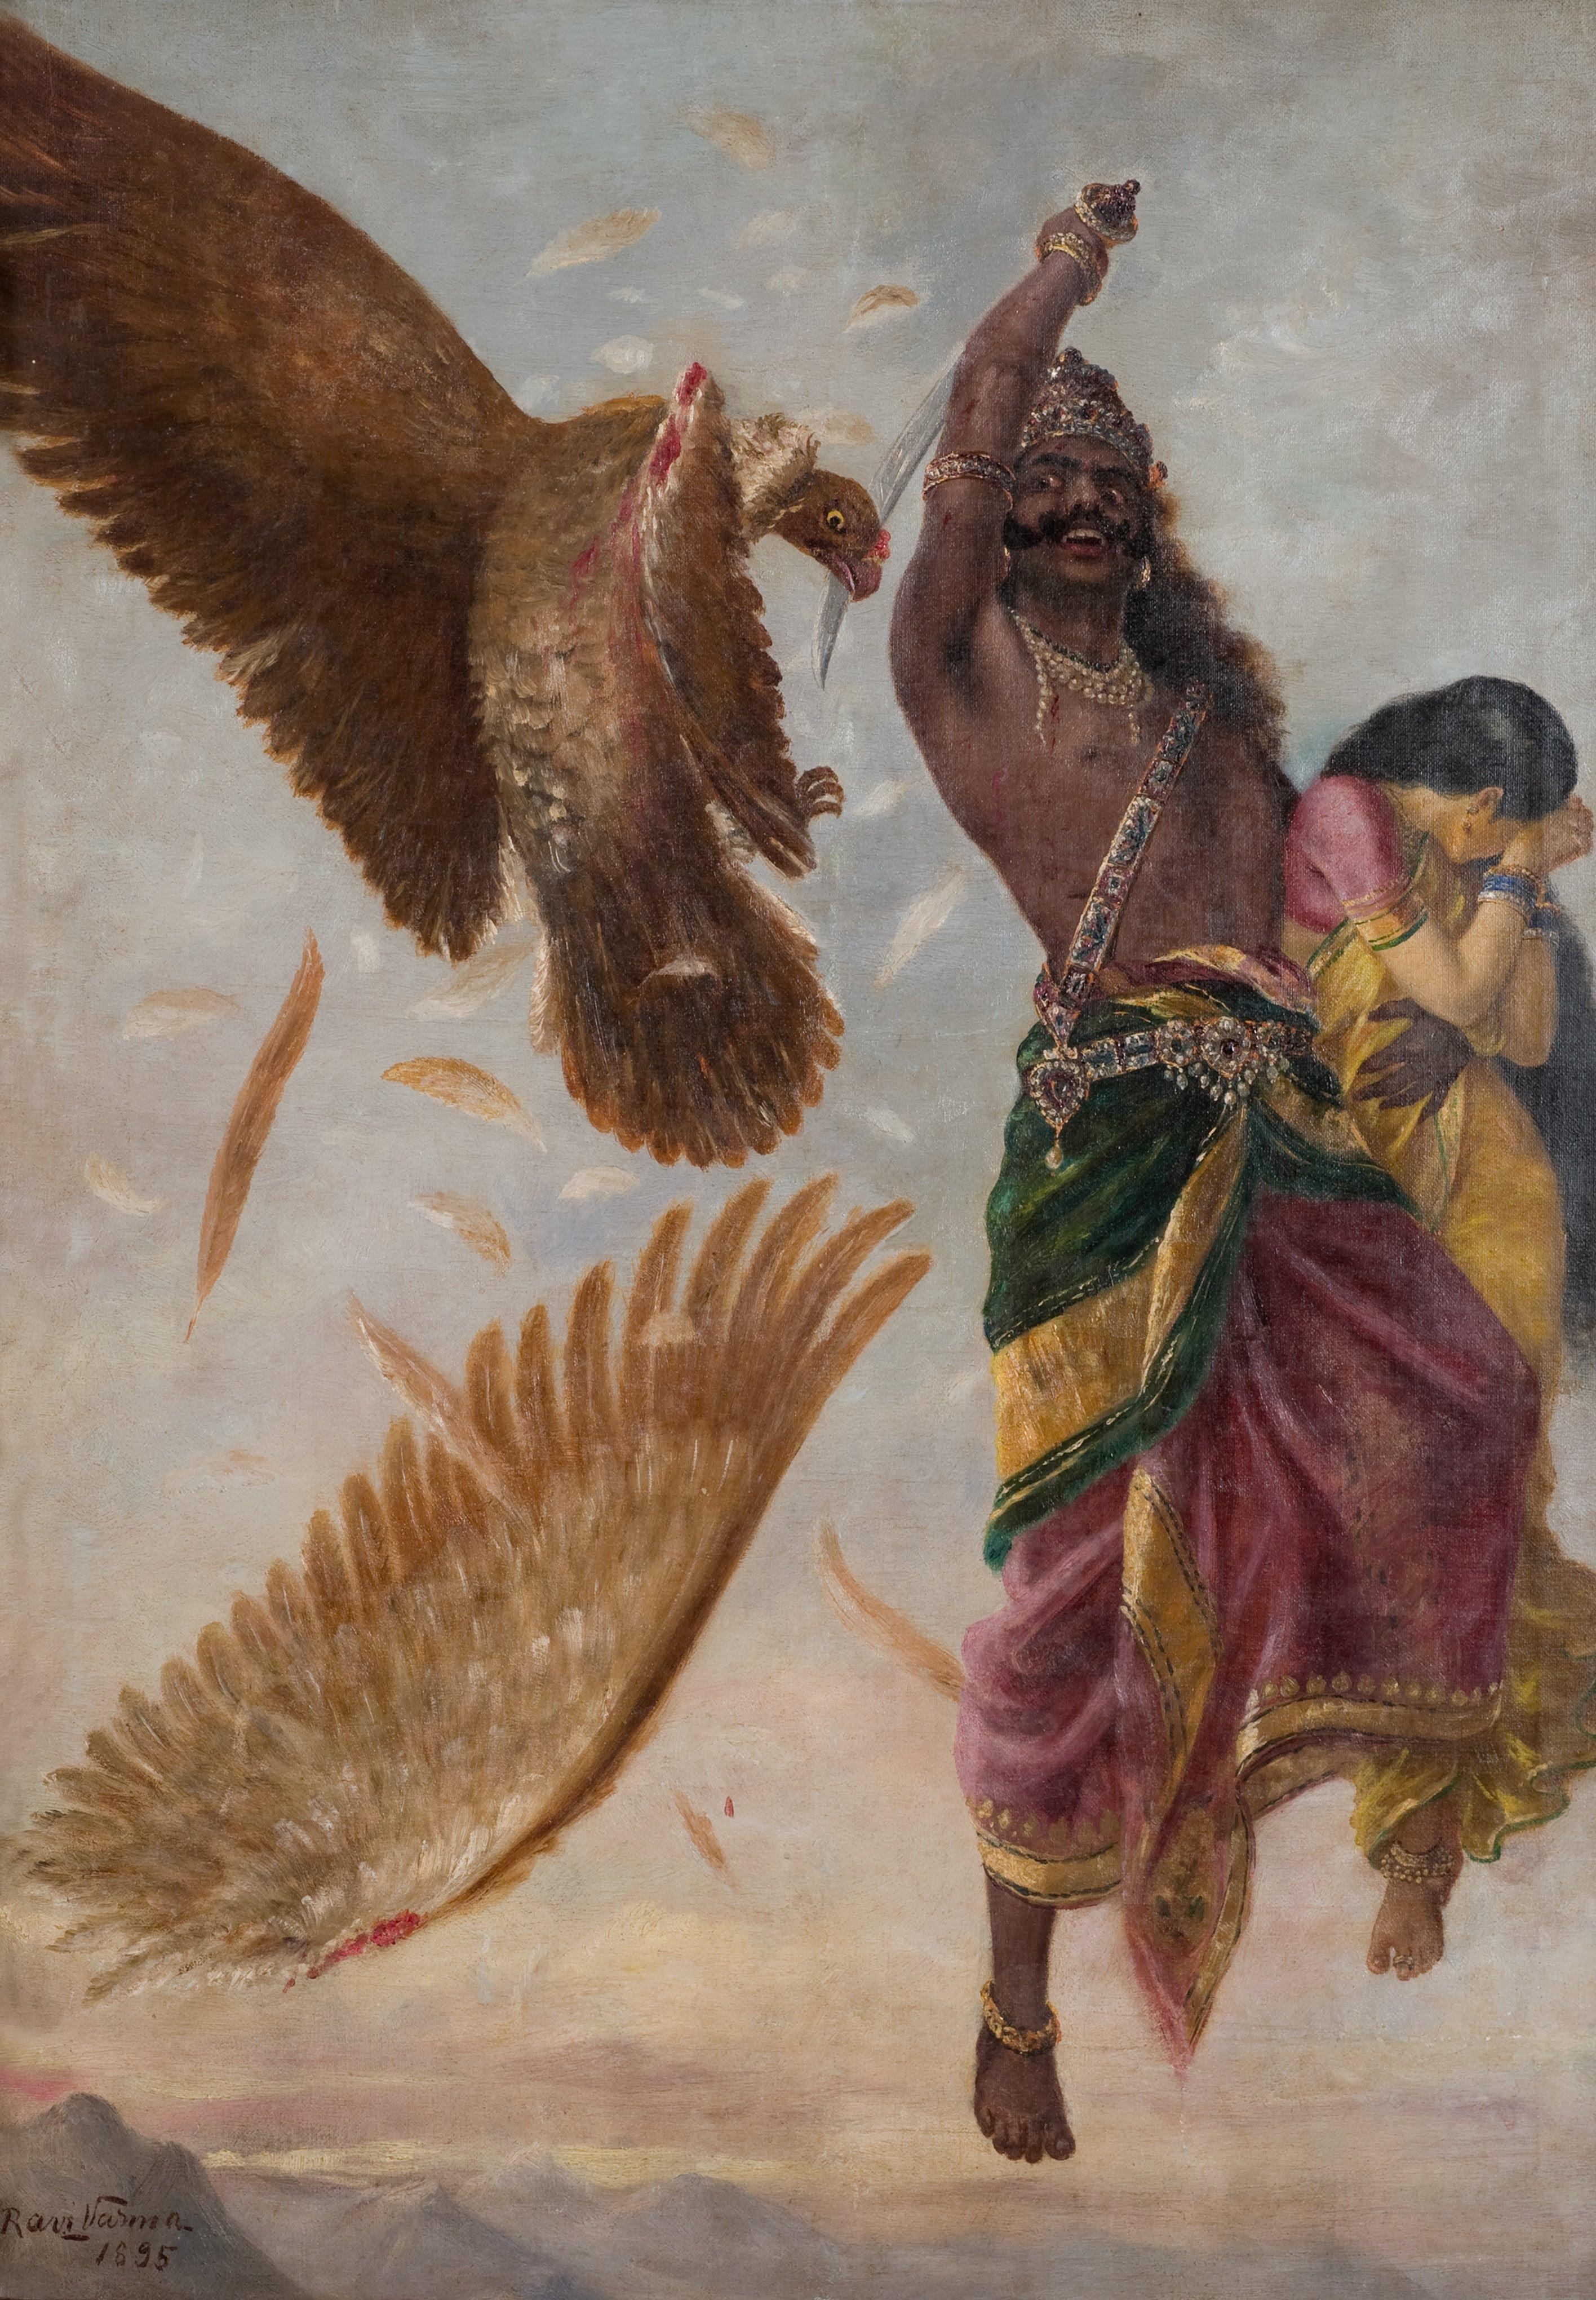 Fileravi Varma Ravana Sita Jathayujpg Wikimedia Commons